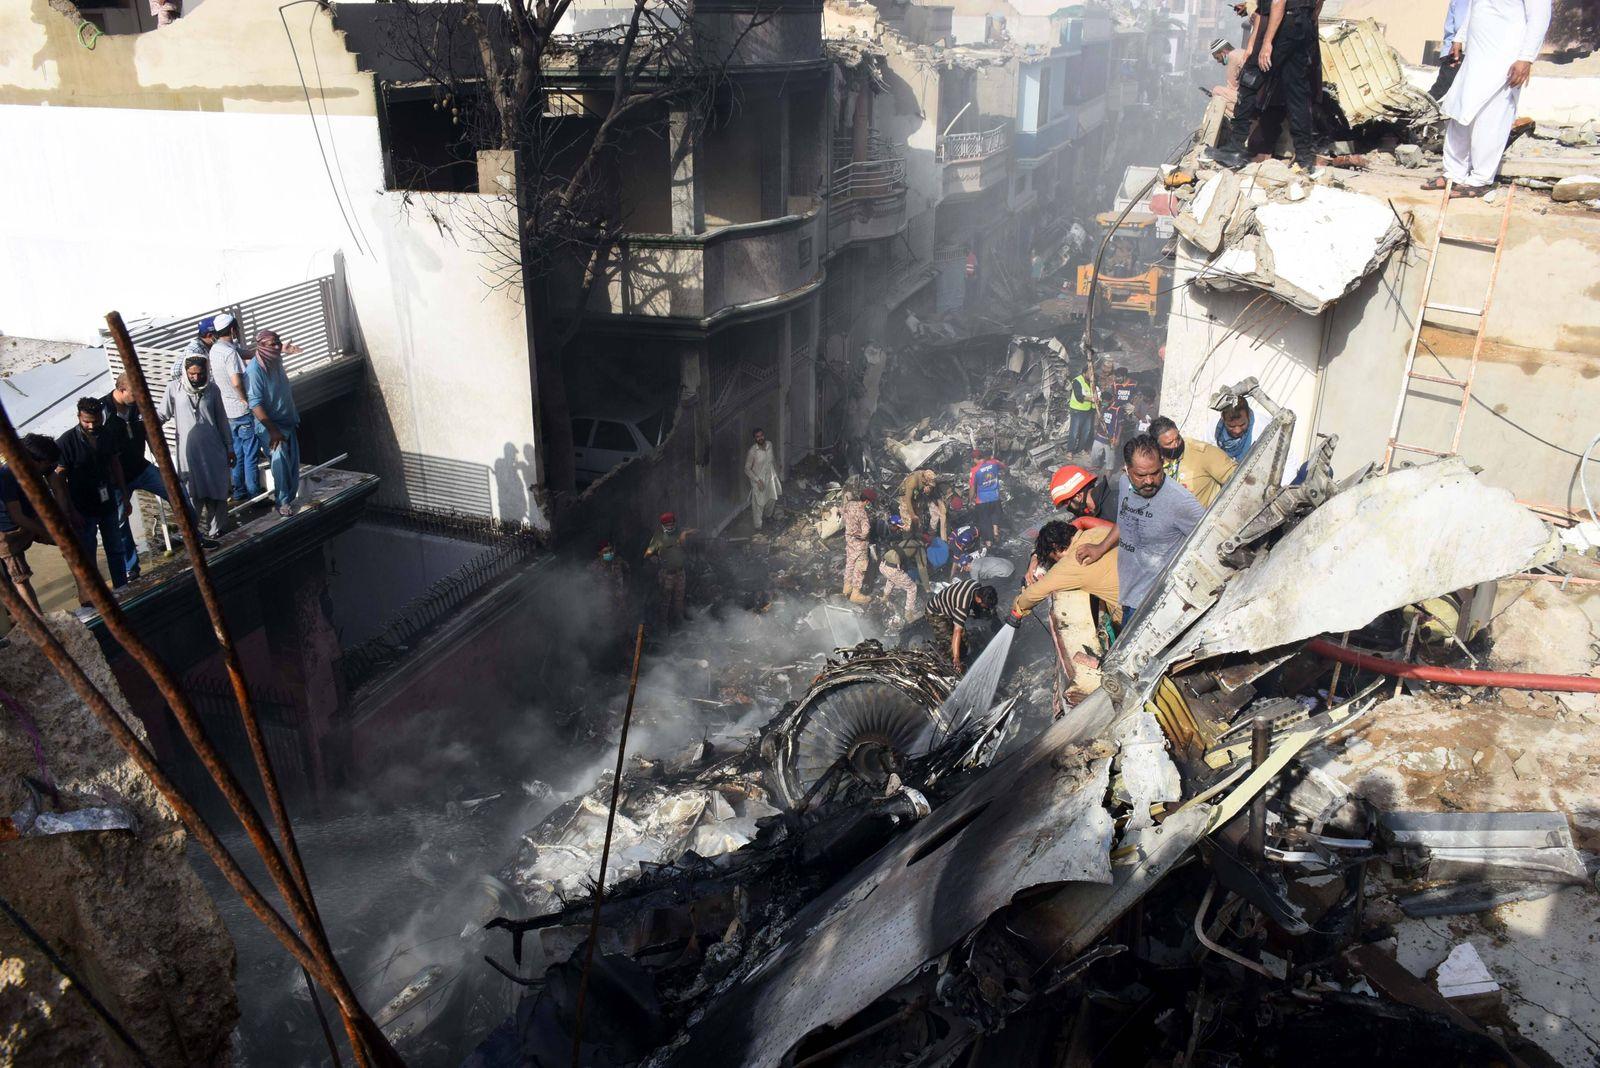 (200522) -- KARACHI, May 22, 2020 -- Rescuers work at the plane crash site in Karachi, Pakistan, May 22, 2020. Rescuers